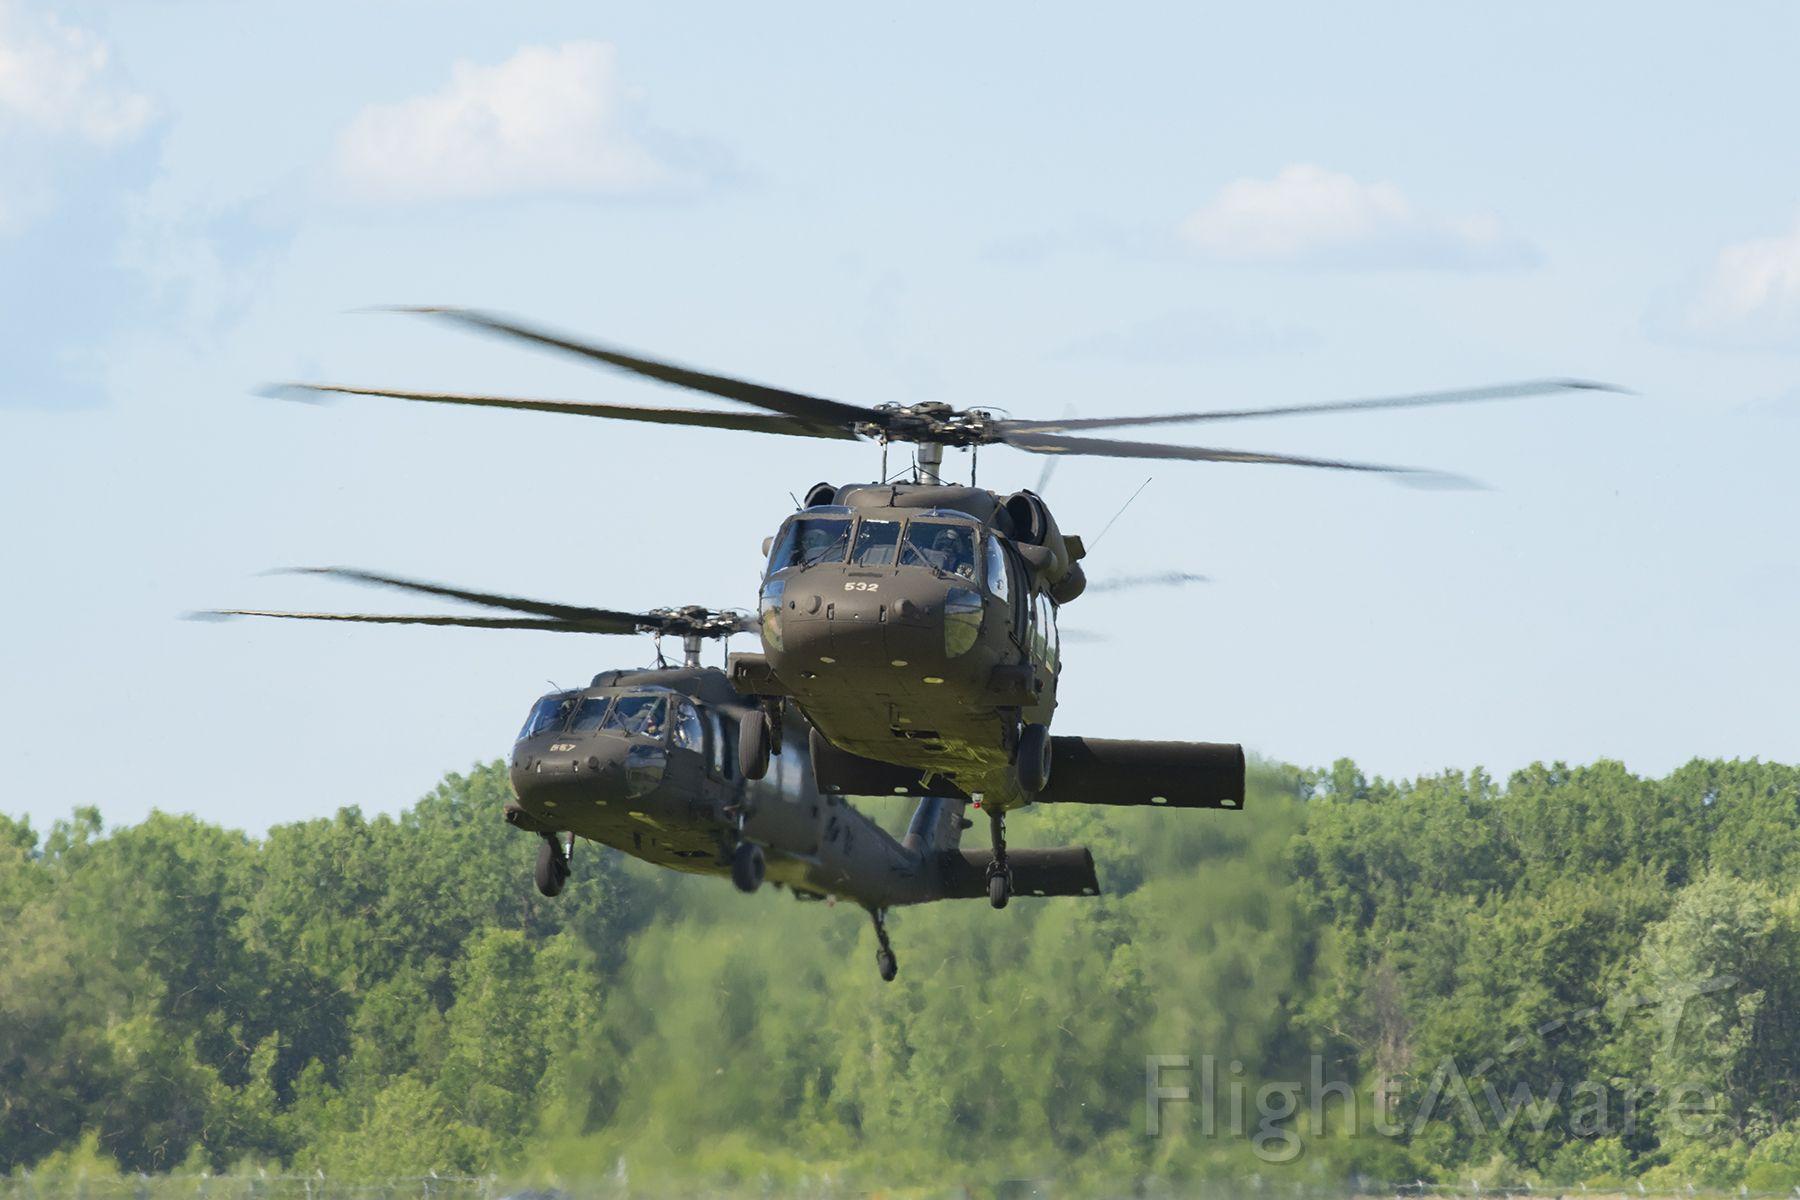 N532 — - Michigan Army National Guard UH-60 Blackhawks on training mission.